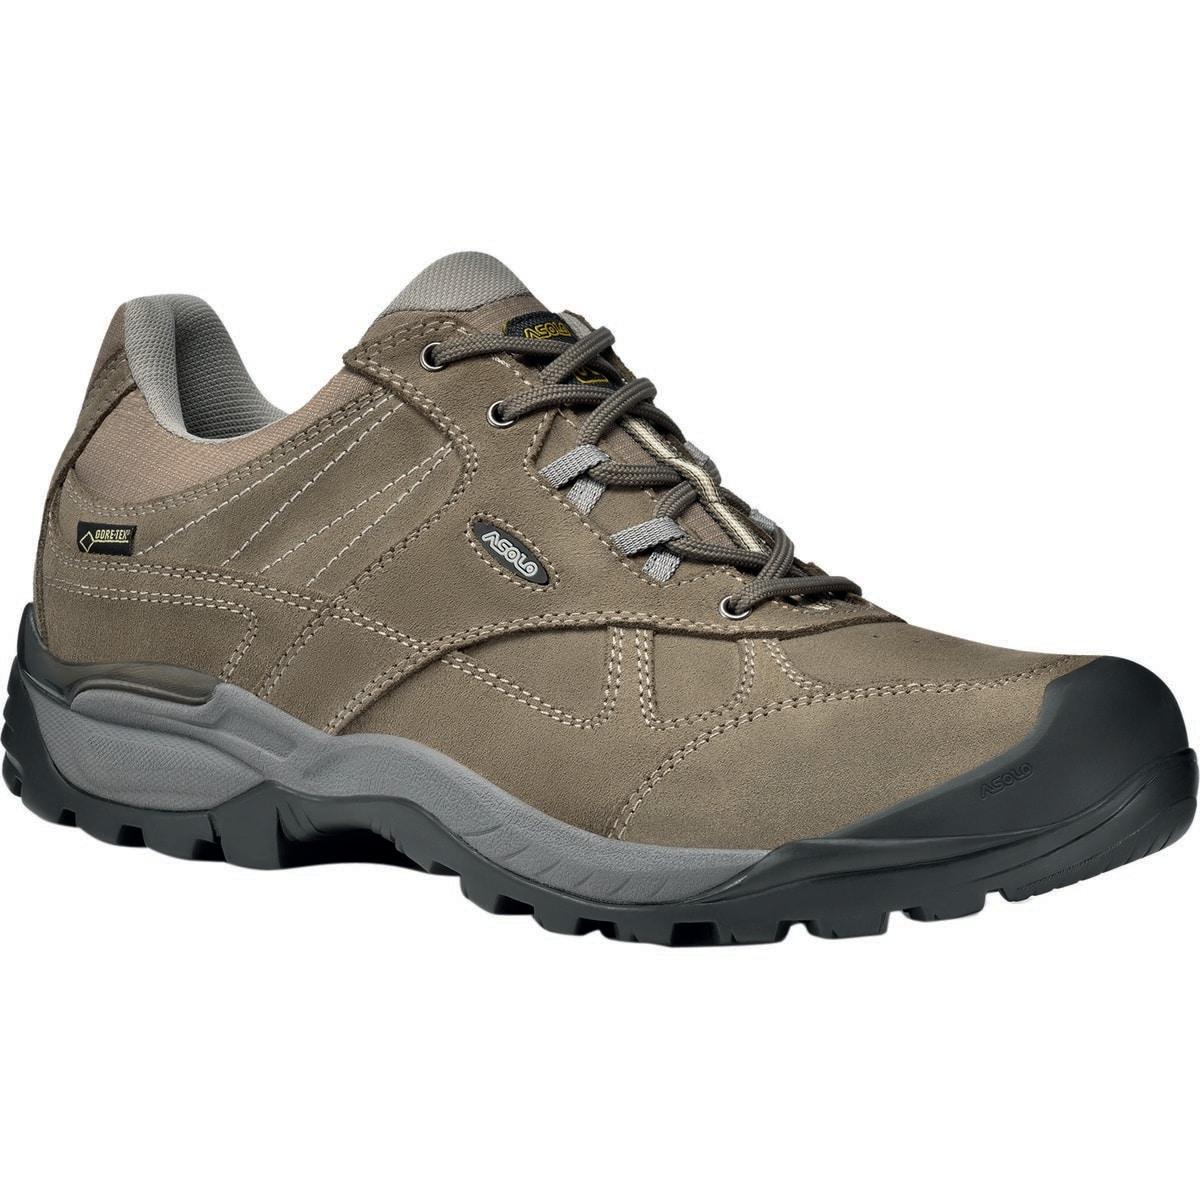 Asolo Nailix GV Hiking Shoe - Men's